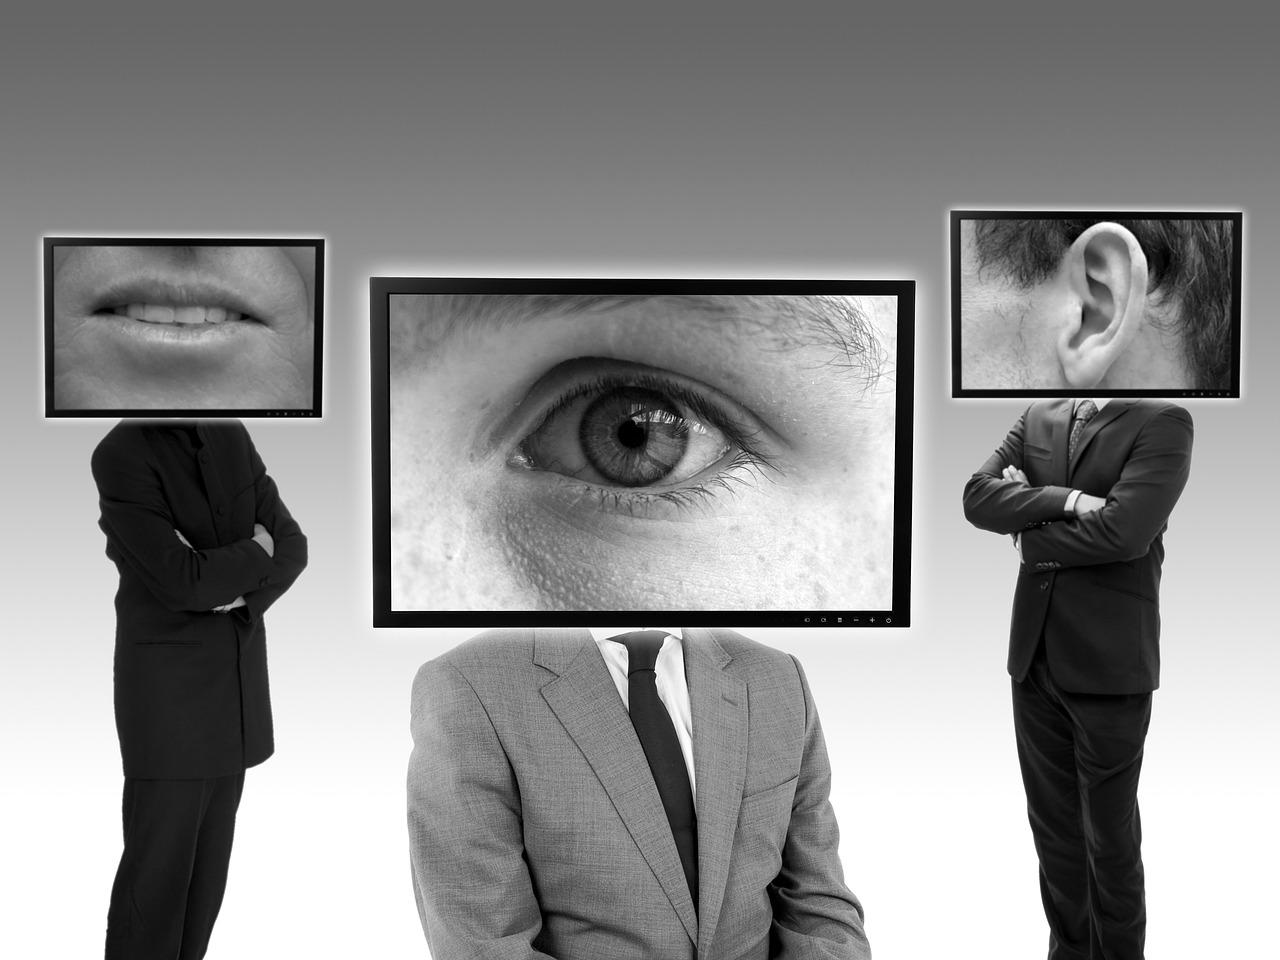 privacy-policy-1624400_1280.jpg